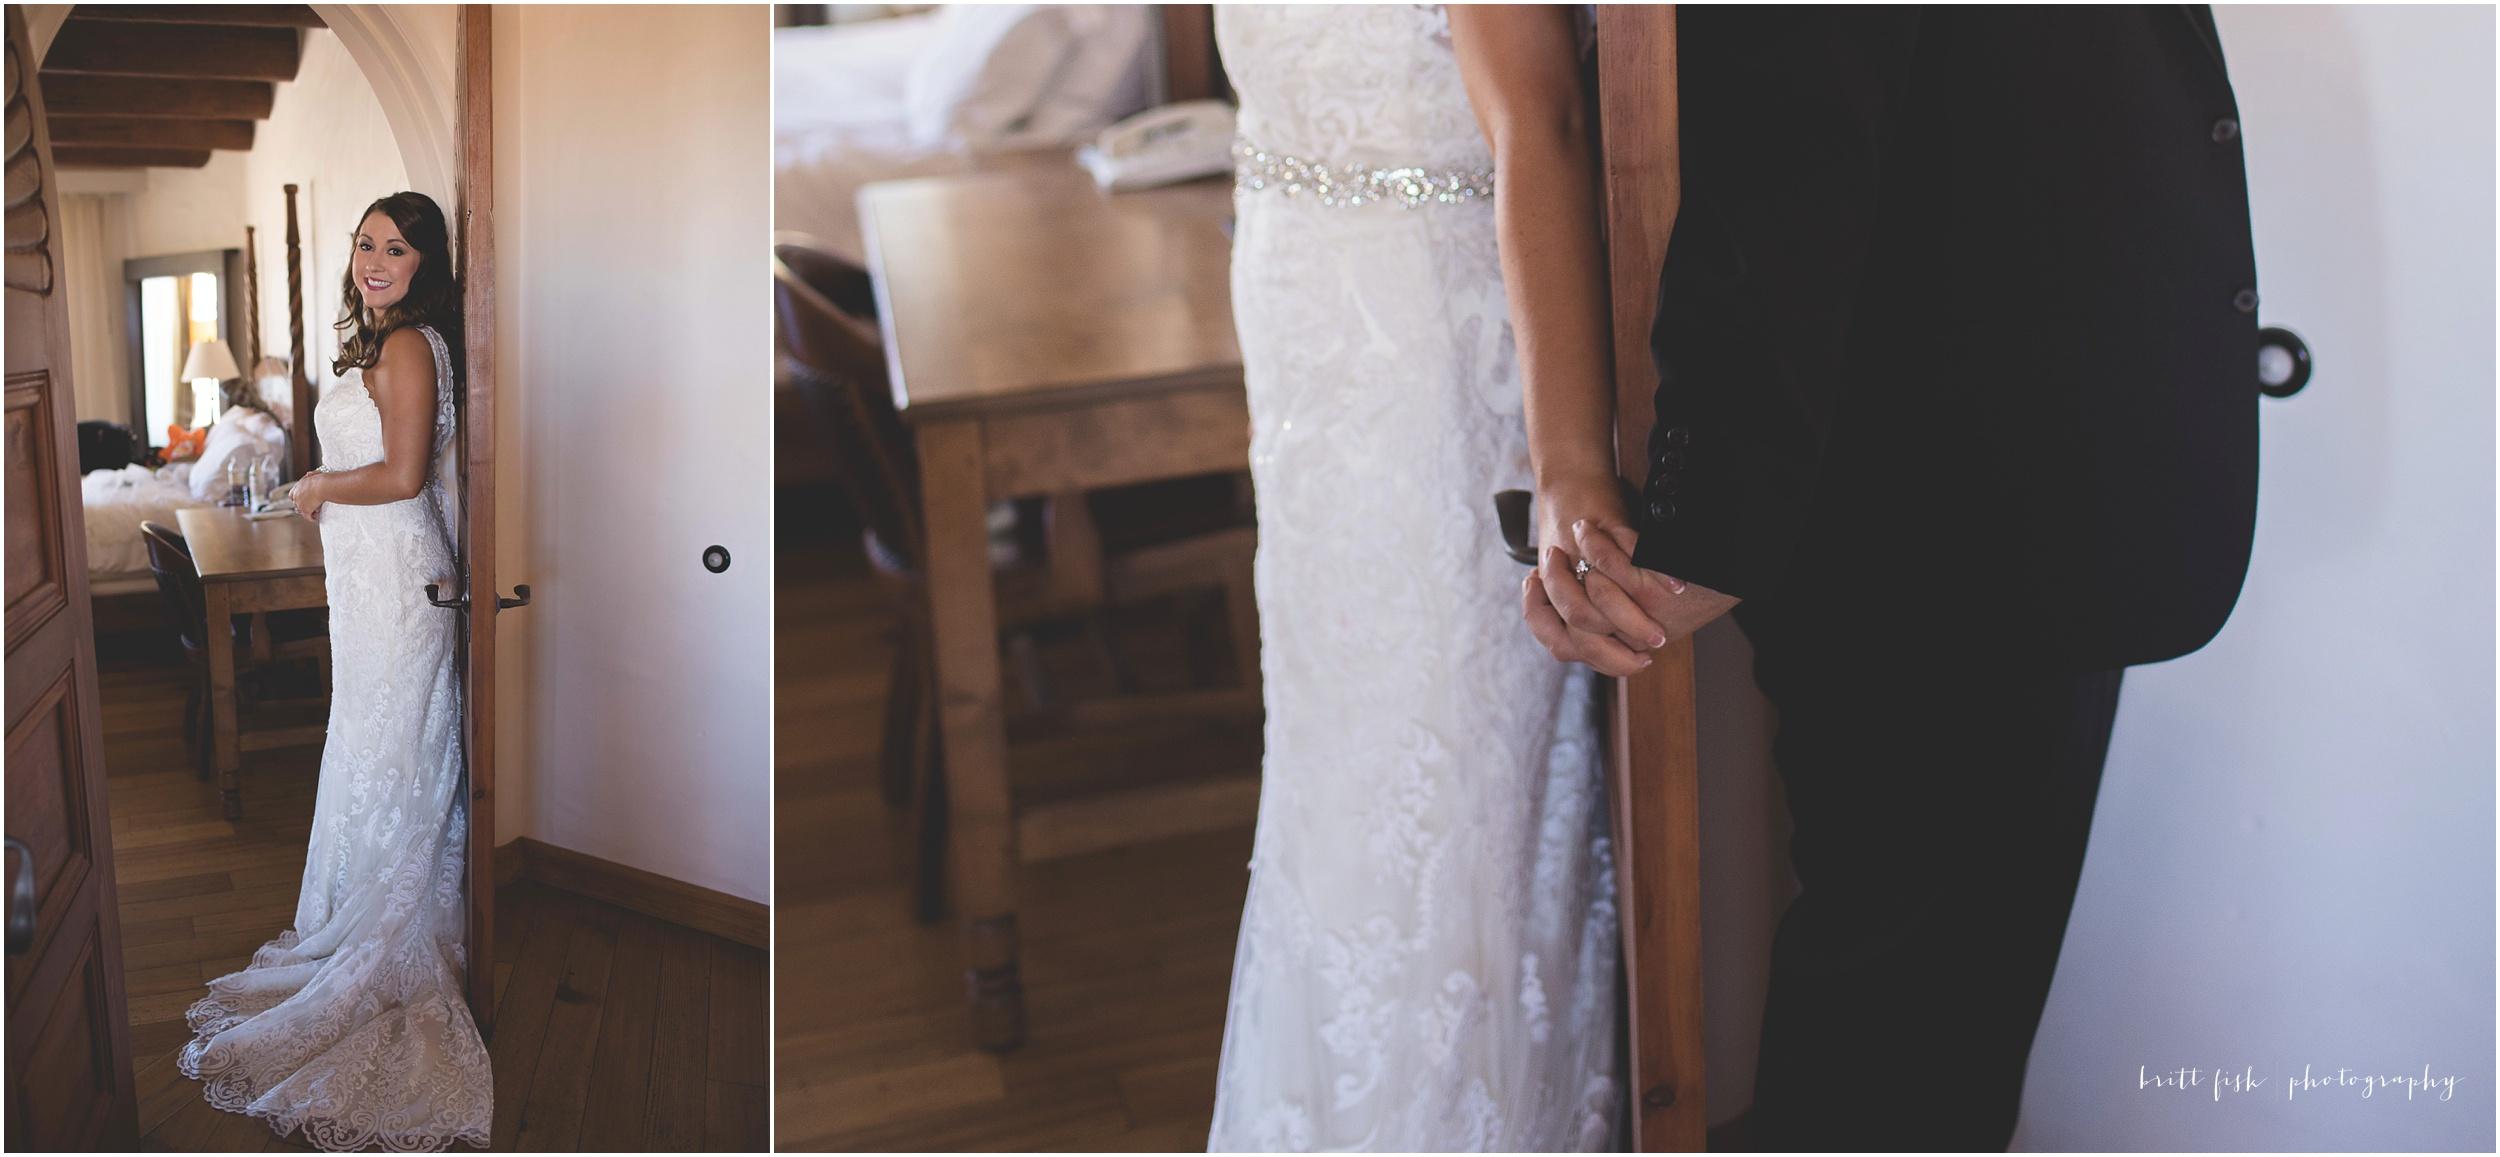 Wedding - Wood - Santa Fe, NM_0013.jpg